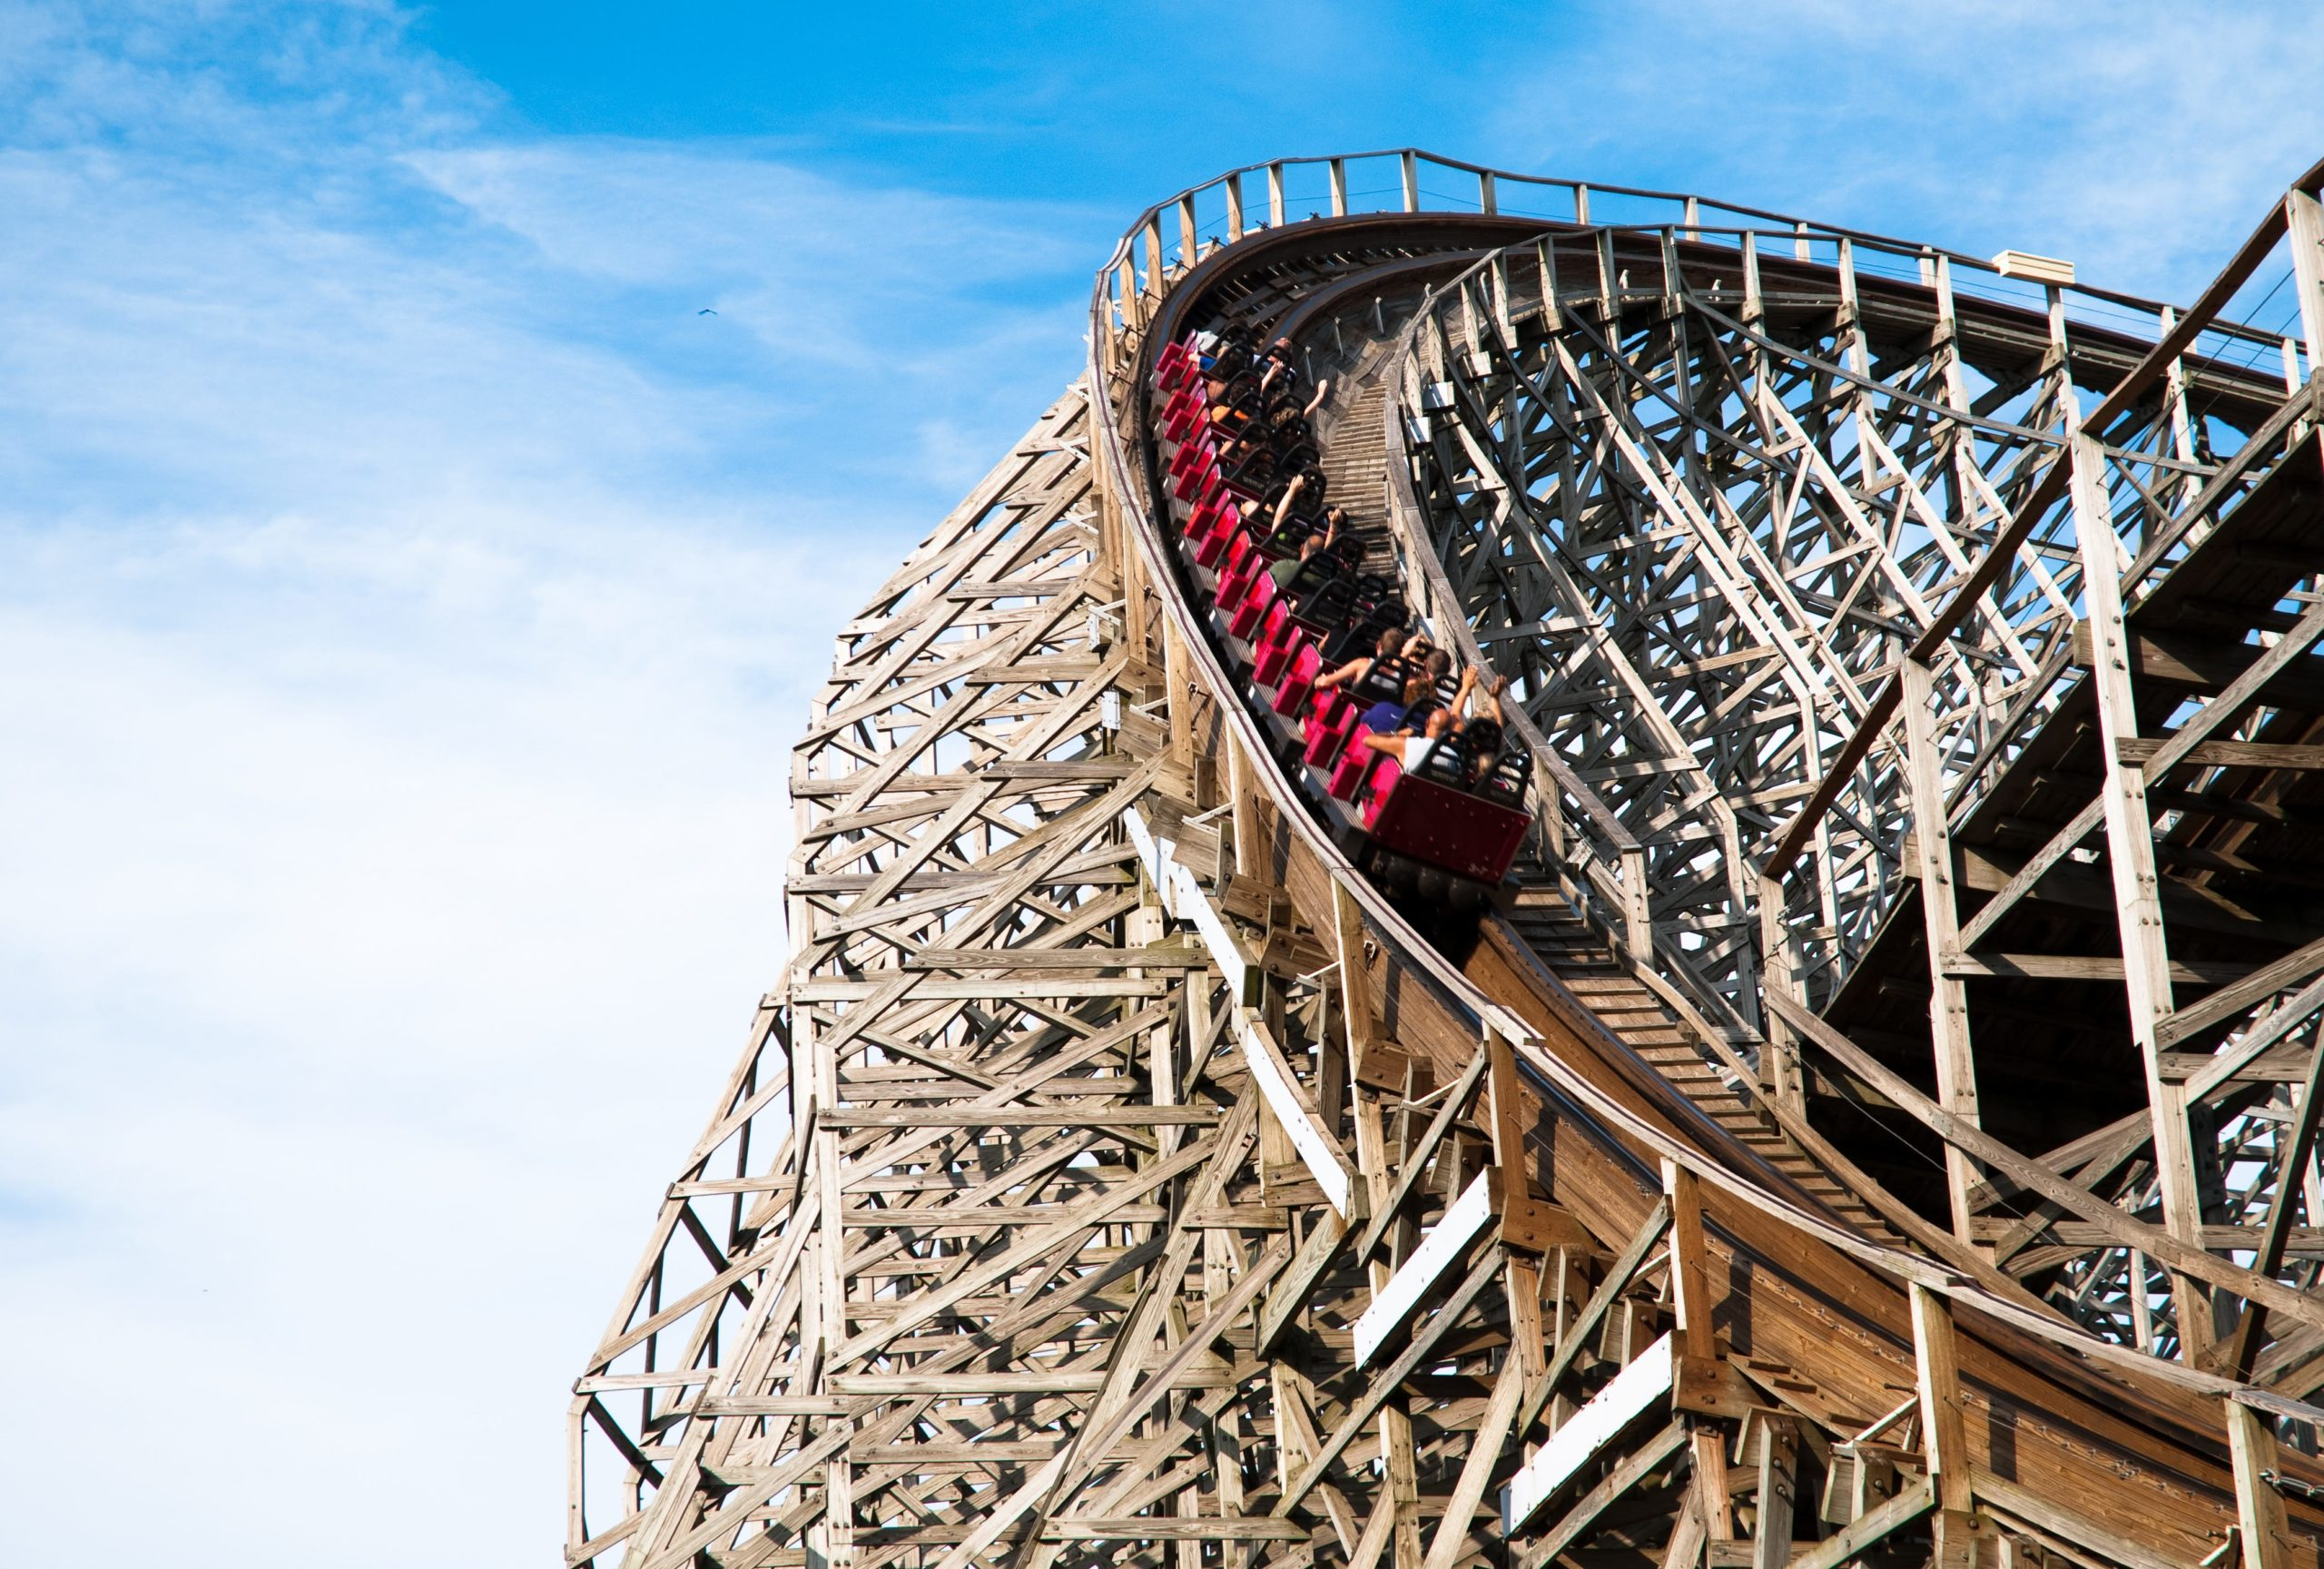 Classic roller coaster with people at Cedar Point, Sandusky, Ohio